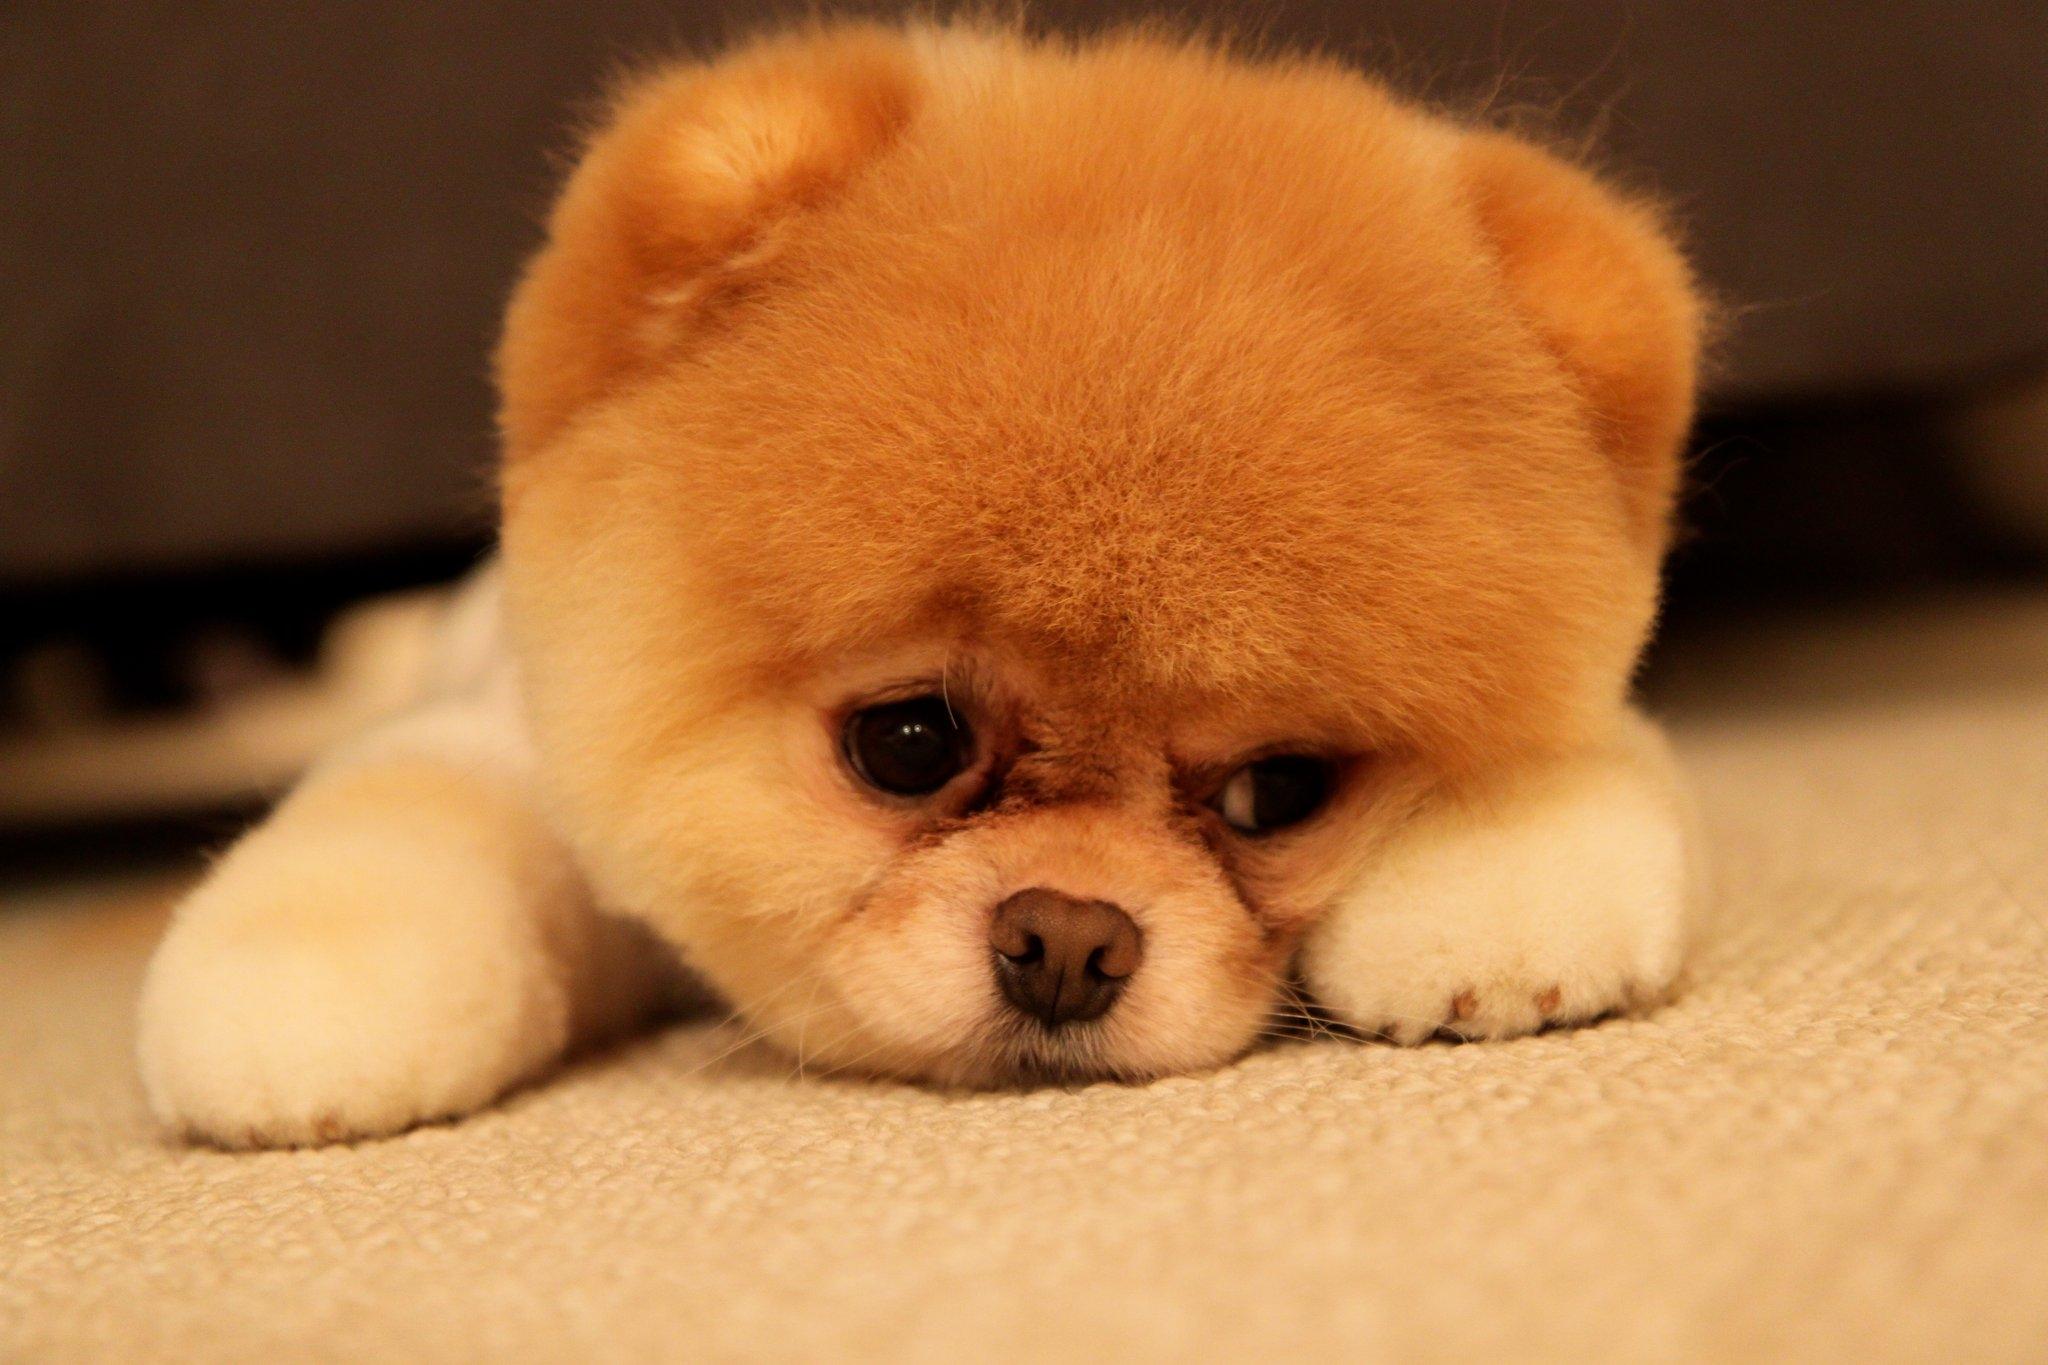 Boo-The-Dog-in-sad-mood-hd-wallpaper